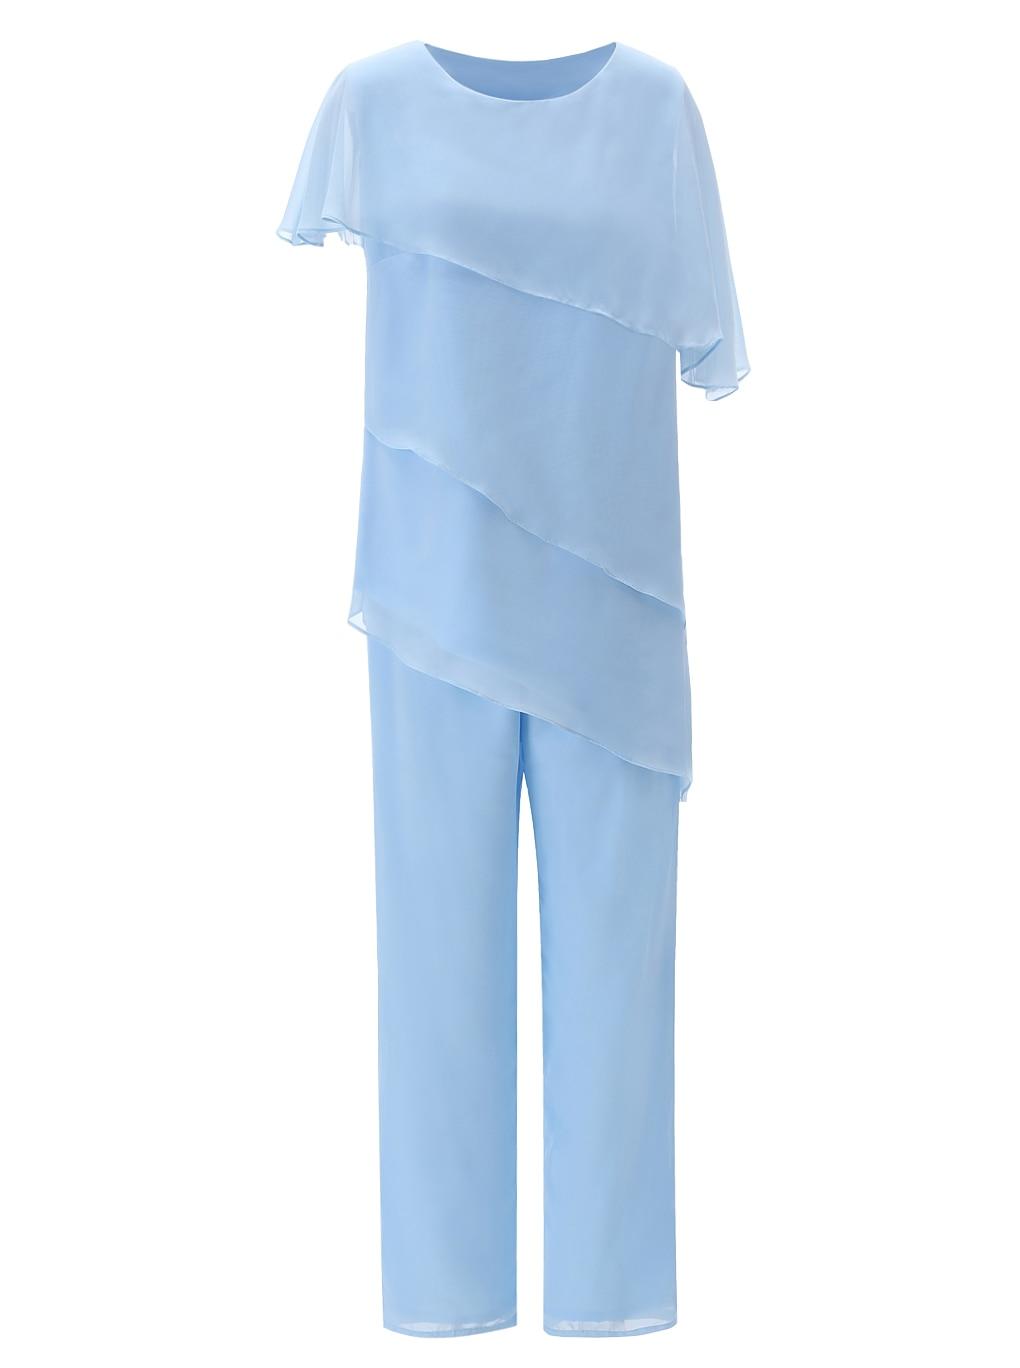 SOLOVEDRESS Women Asymmetrical Chiffon Fashion 2 Pieces Asymmetrical Mother Of The Bride Dress Pant Suits For Wedding SL-M10